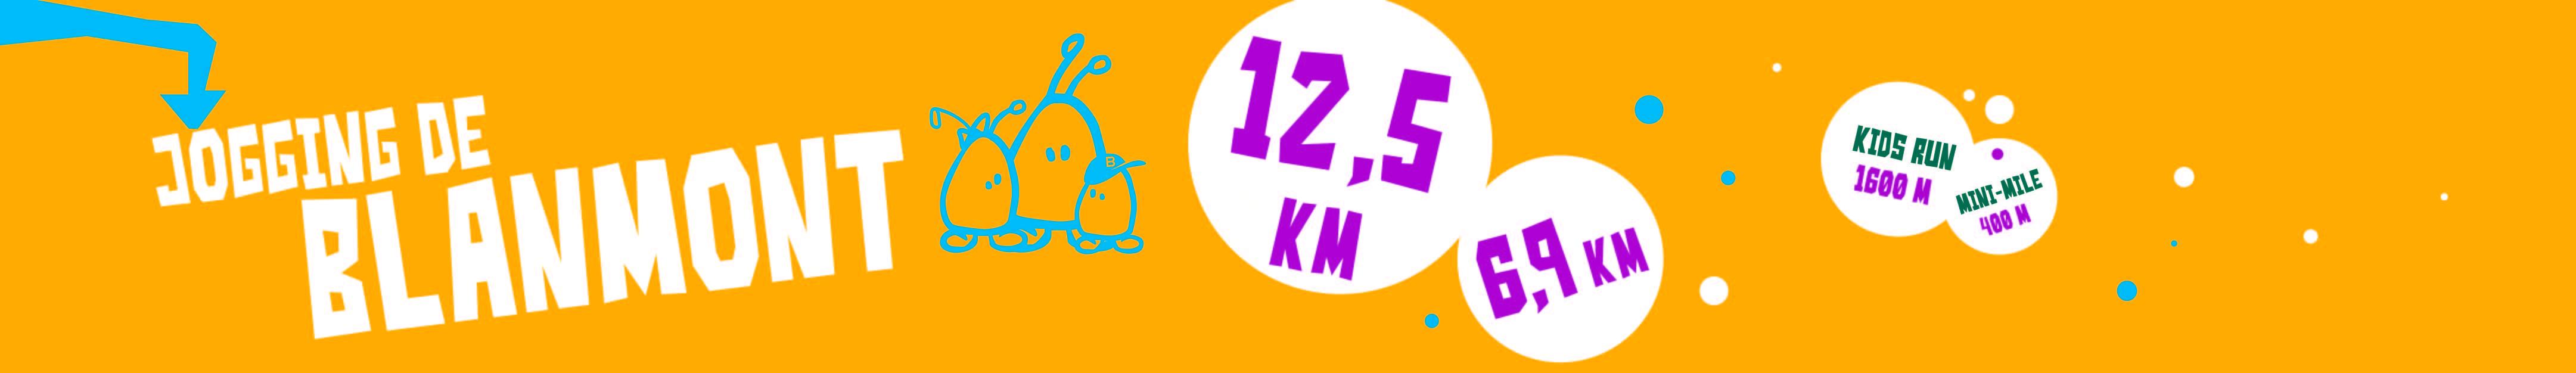 Jogging de Blanmont